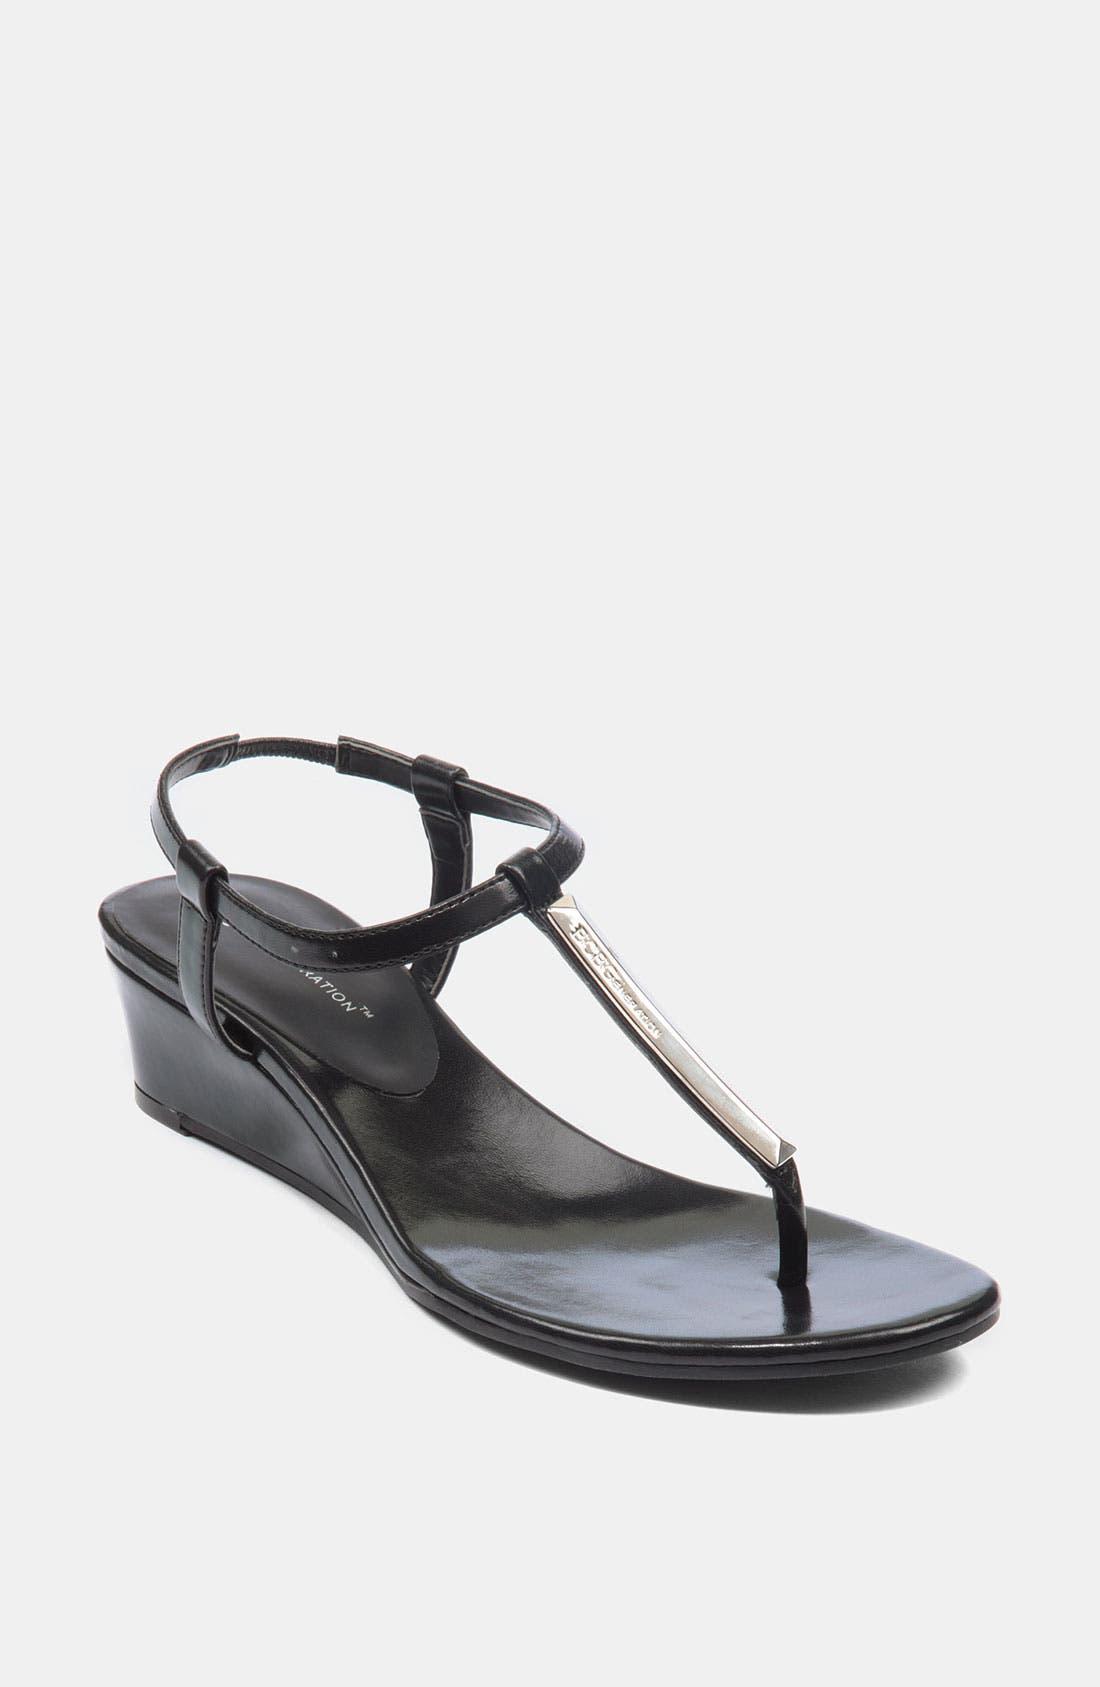 Alternate Image 1 Selected - BCBGeneration 'Jiffie' Sandal